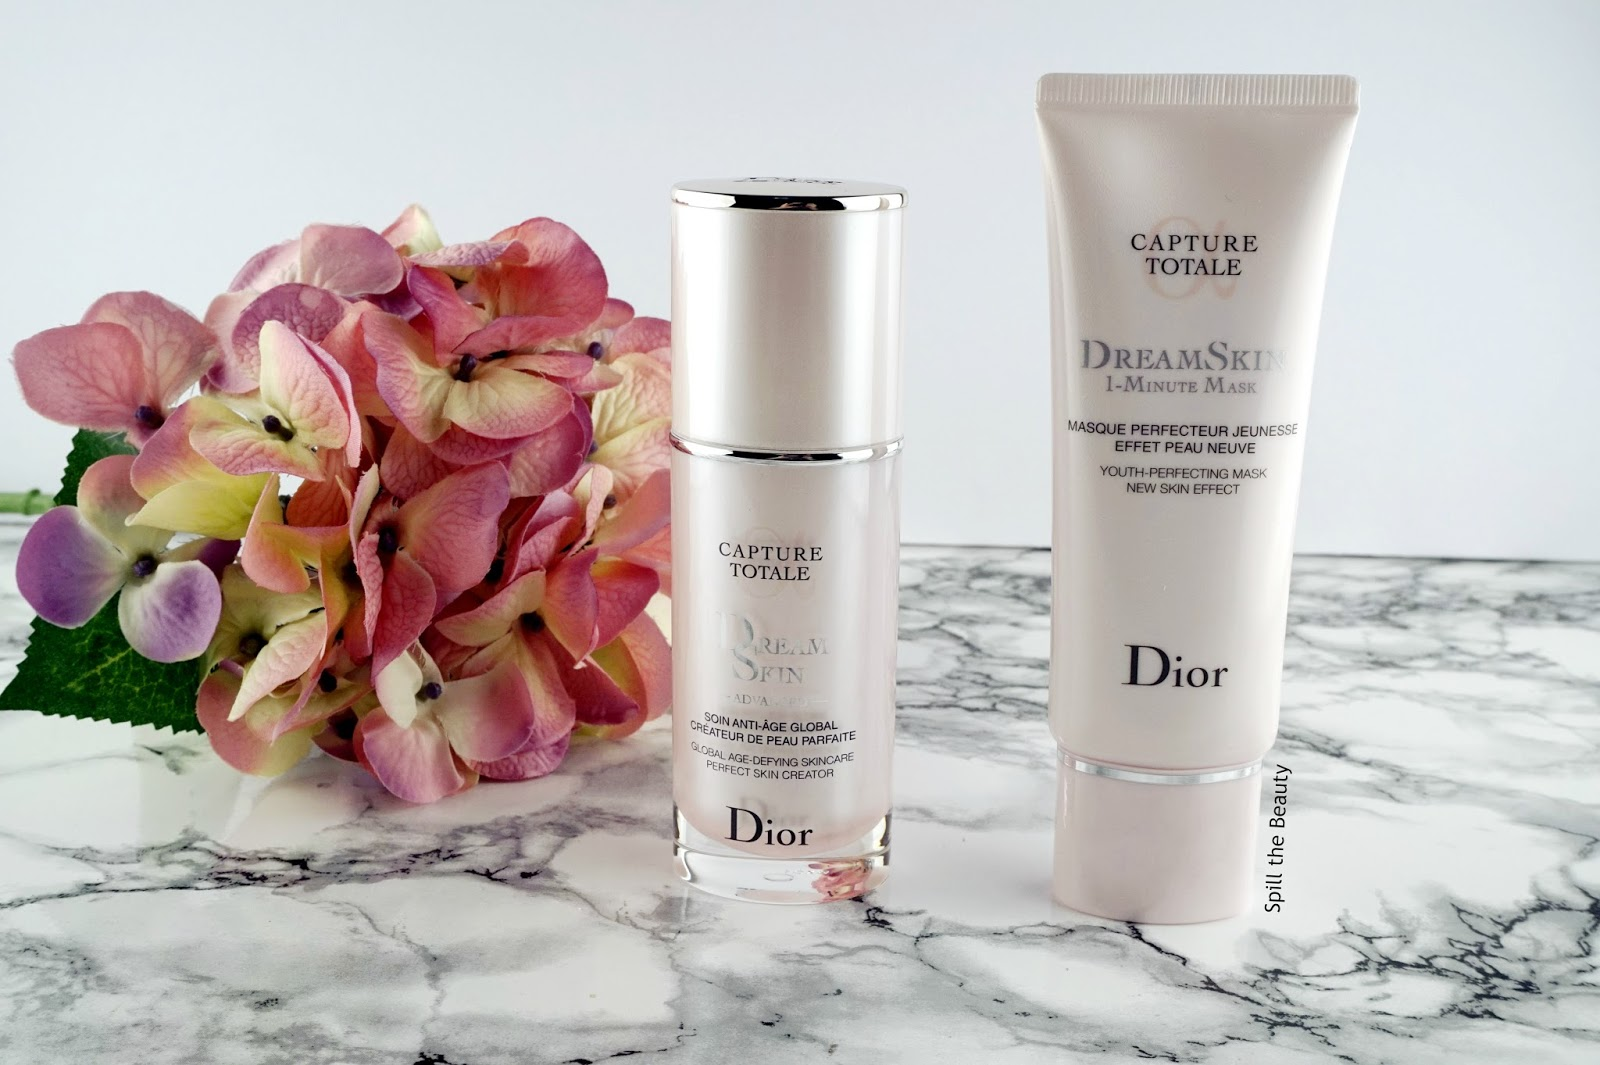 Dior DreamSkin Advanced & 1-Minute Mask - Information